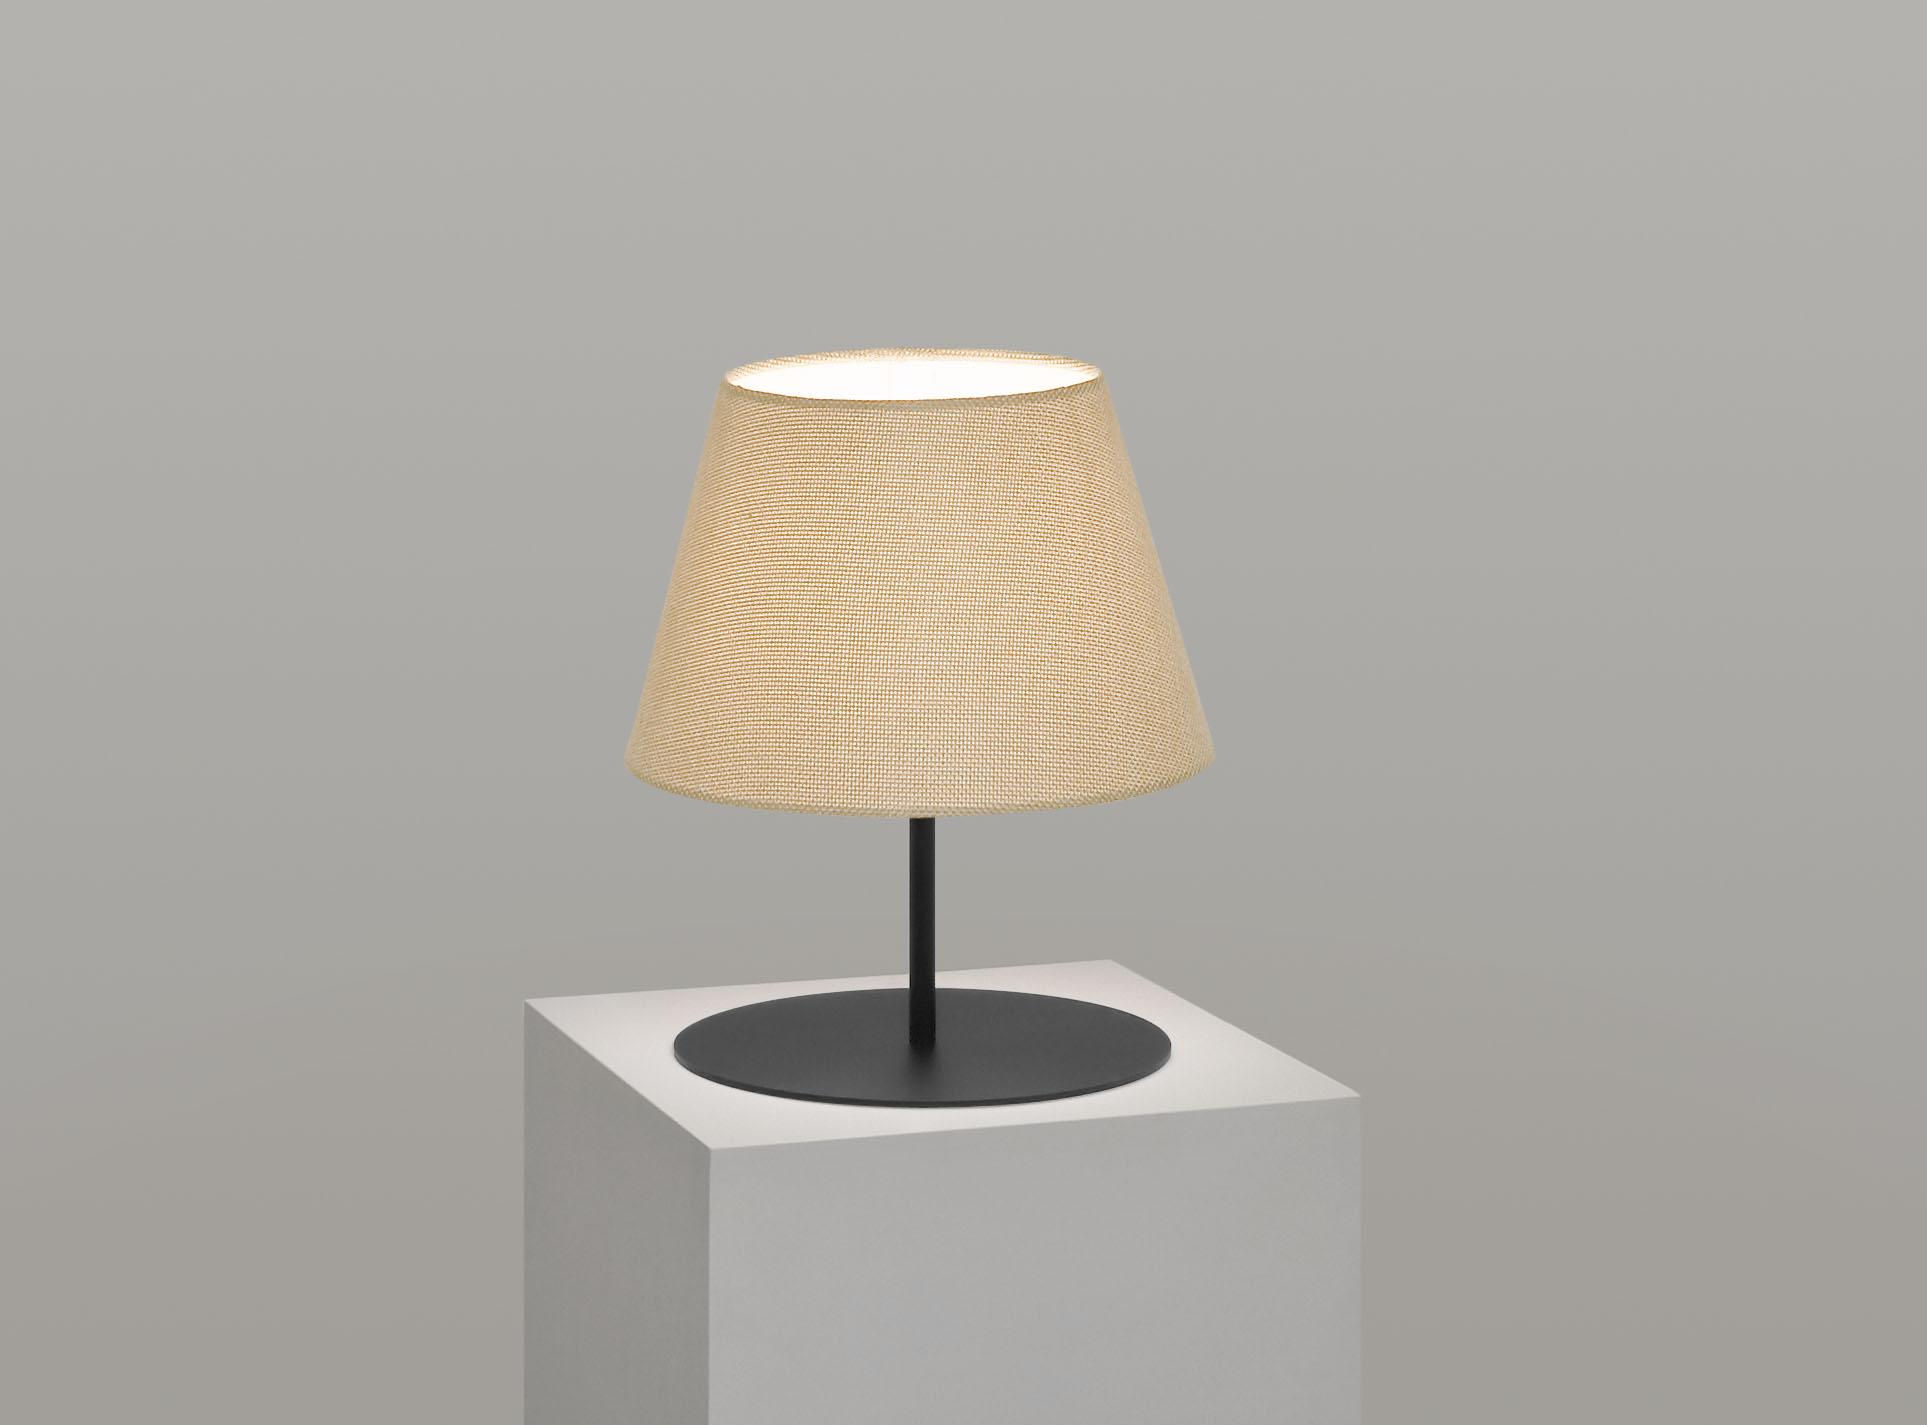 pegasus_lamp_black_base_hessian.jpg